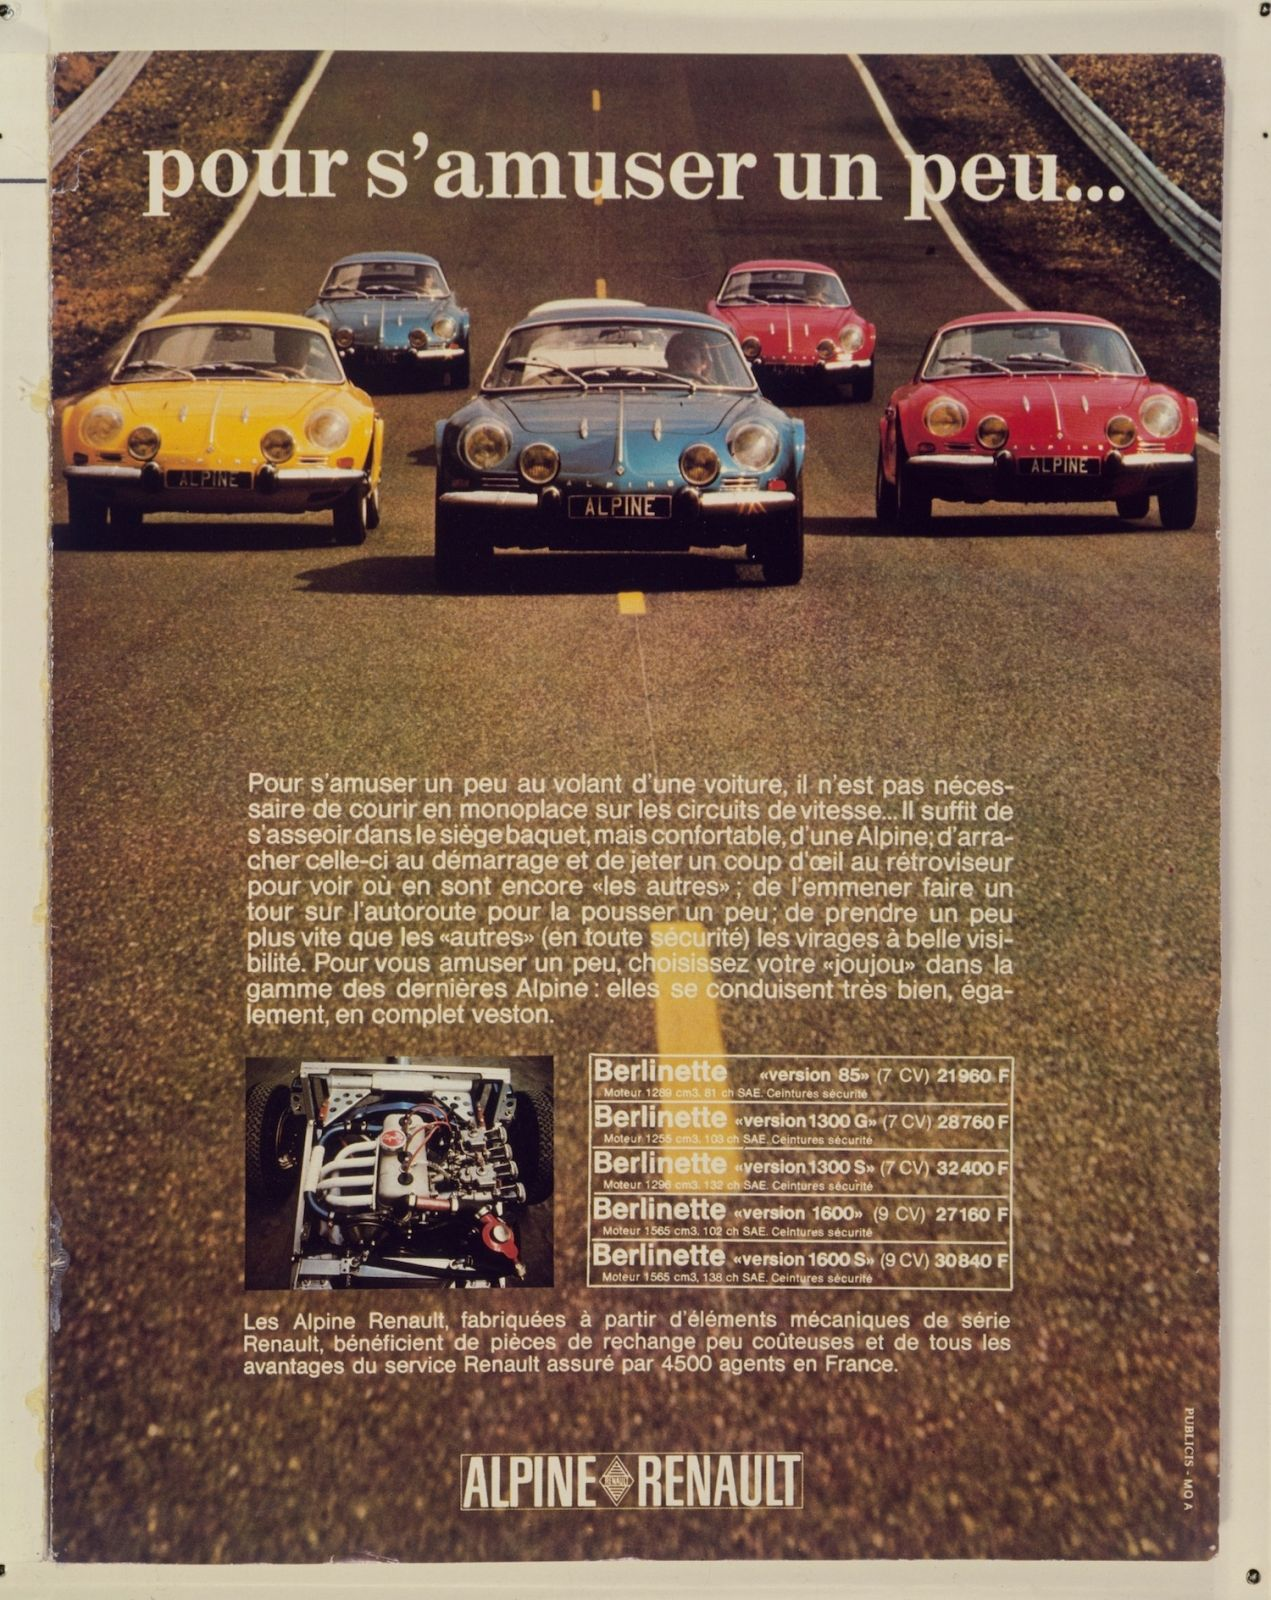 Alpine A110 1300s 13 Jpg 1271 1600 Car Advertising Car Posters Volkswagen Bus